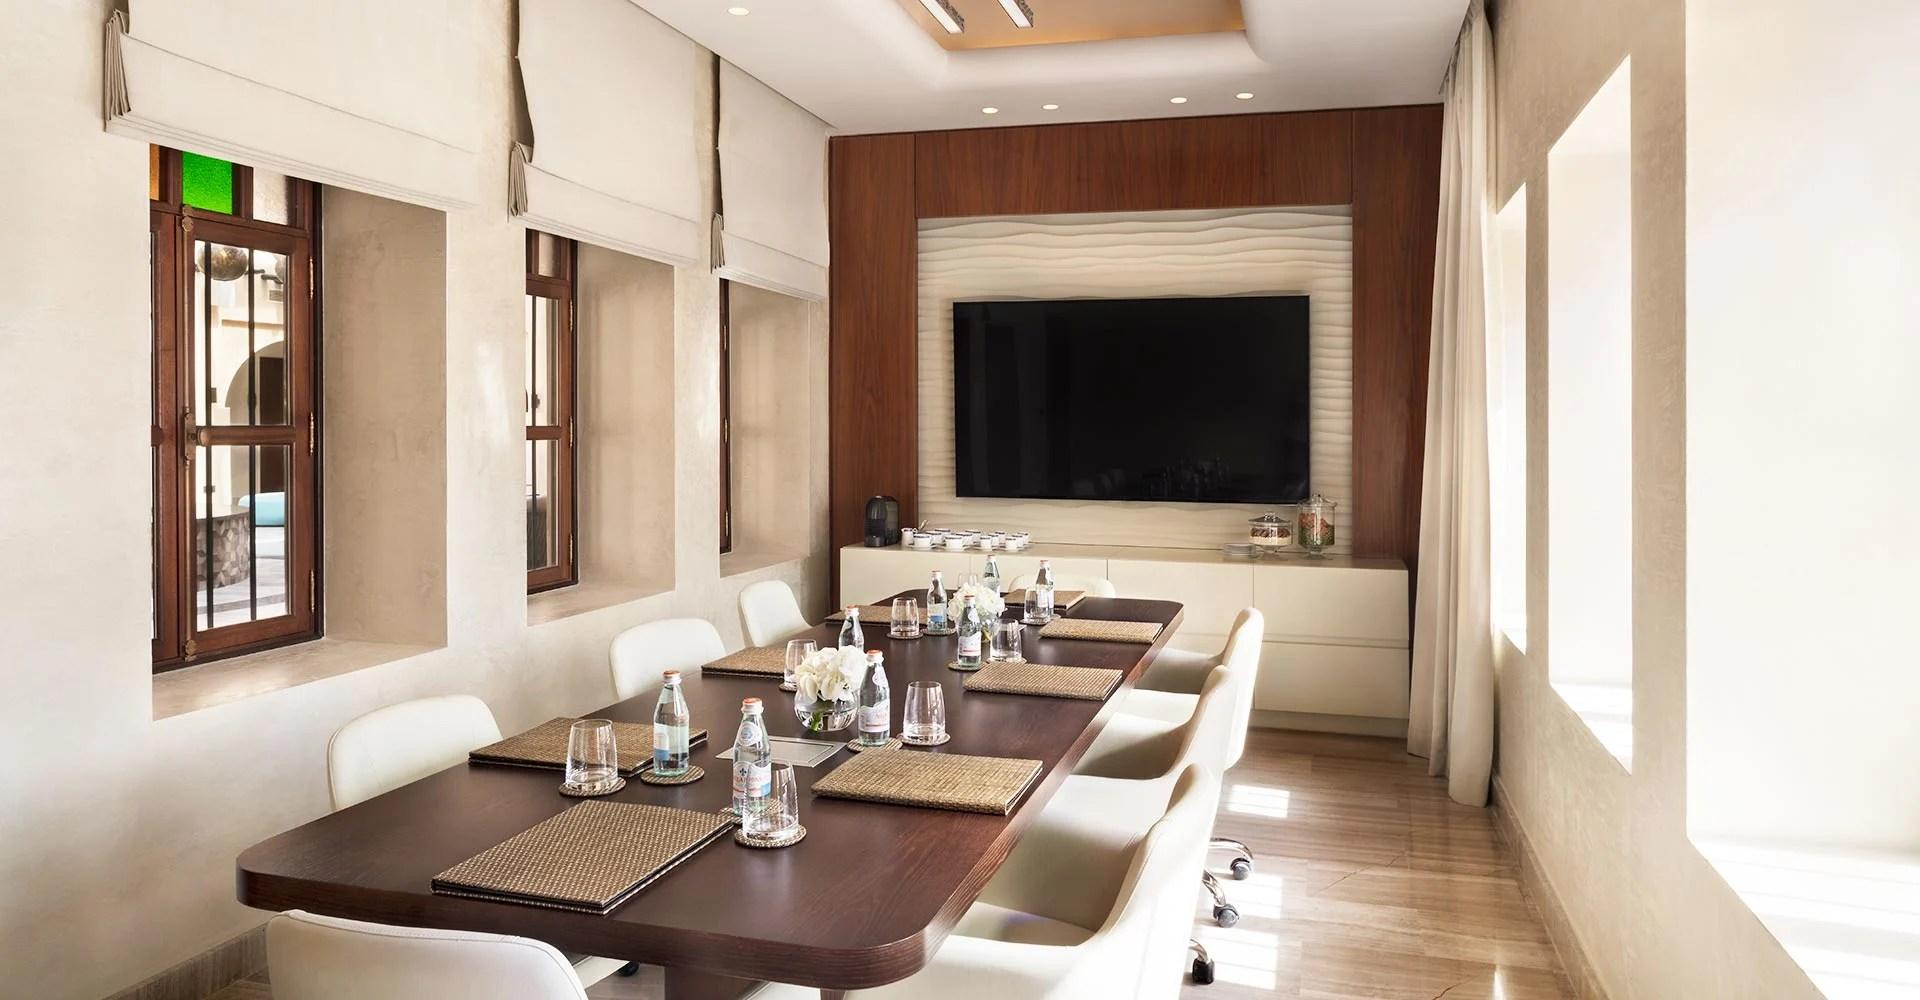 Qatar Living Room For Al Wakra  Wallpaperall